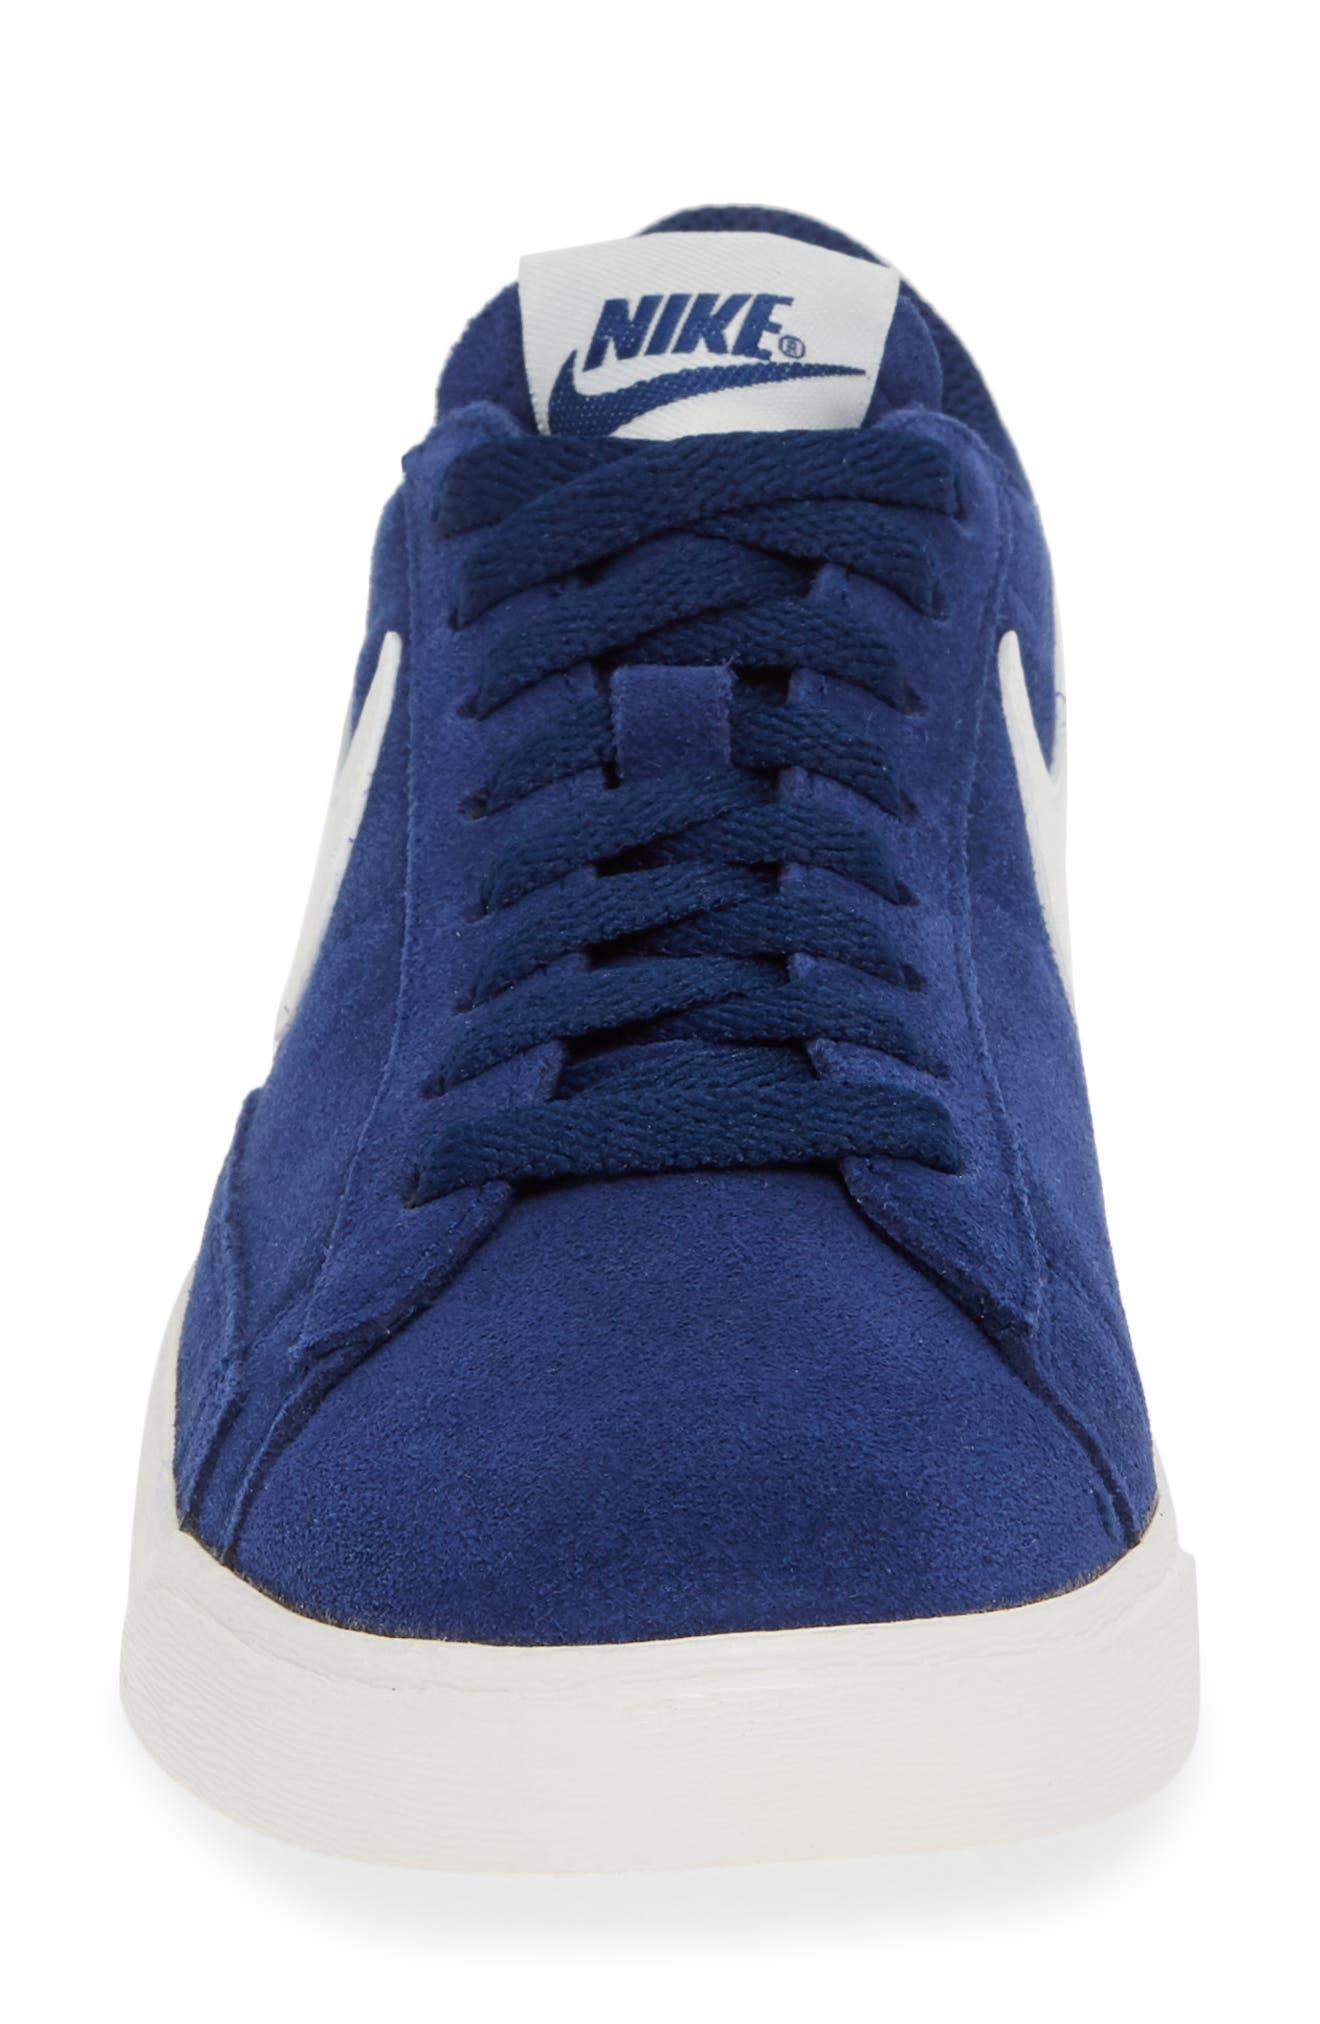 Blazer Low Sneaker,                             Alternate thumbnail 4, color,                             402